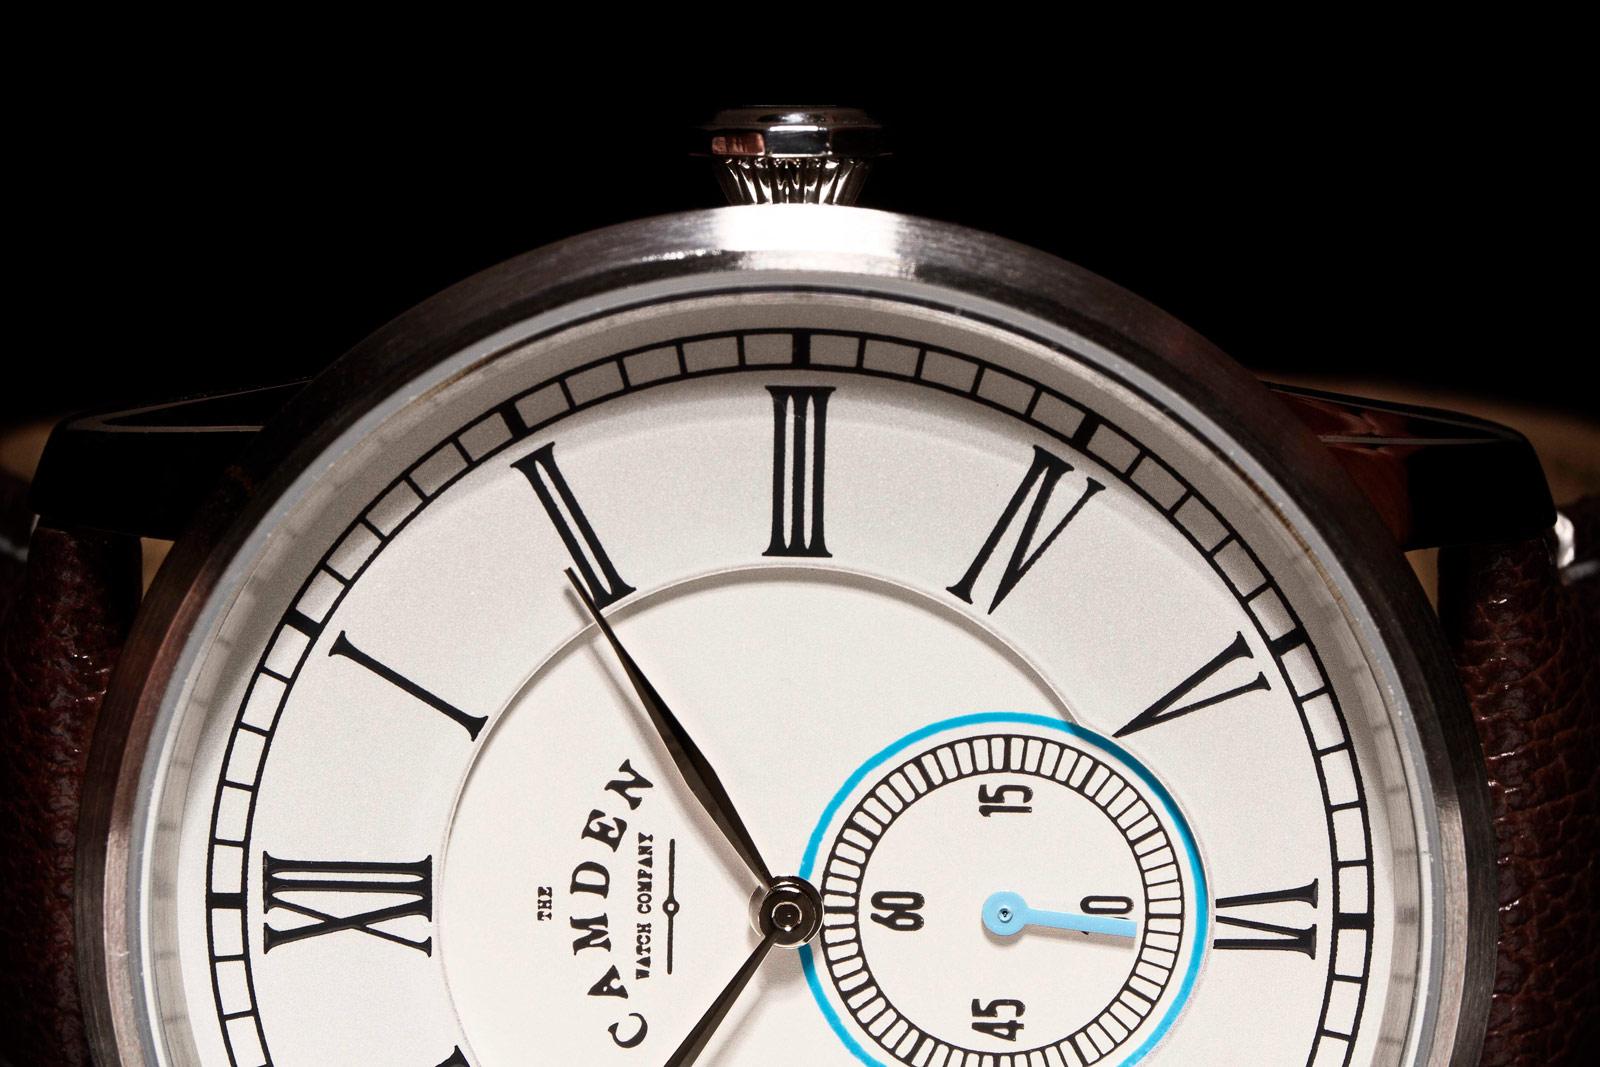 camden-watch-company-4